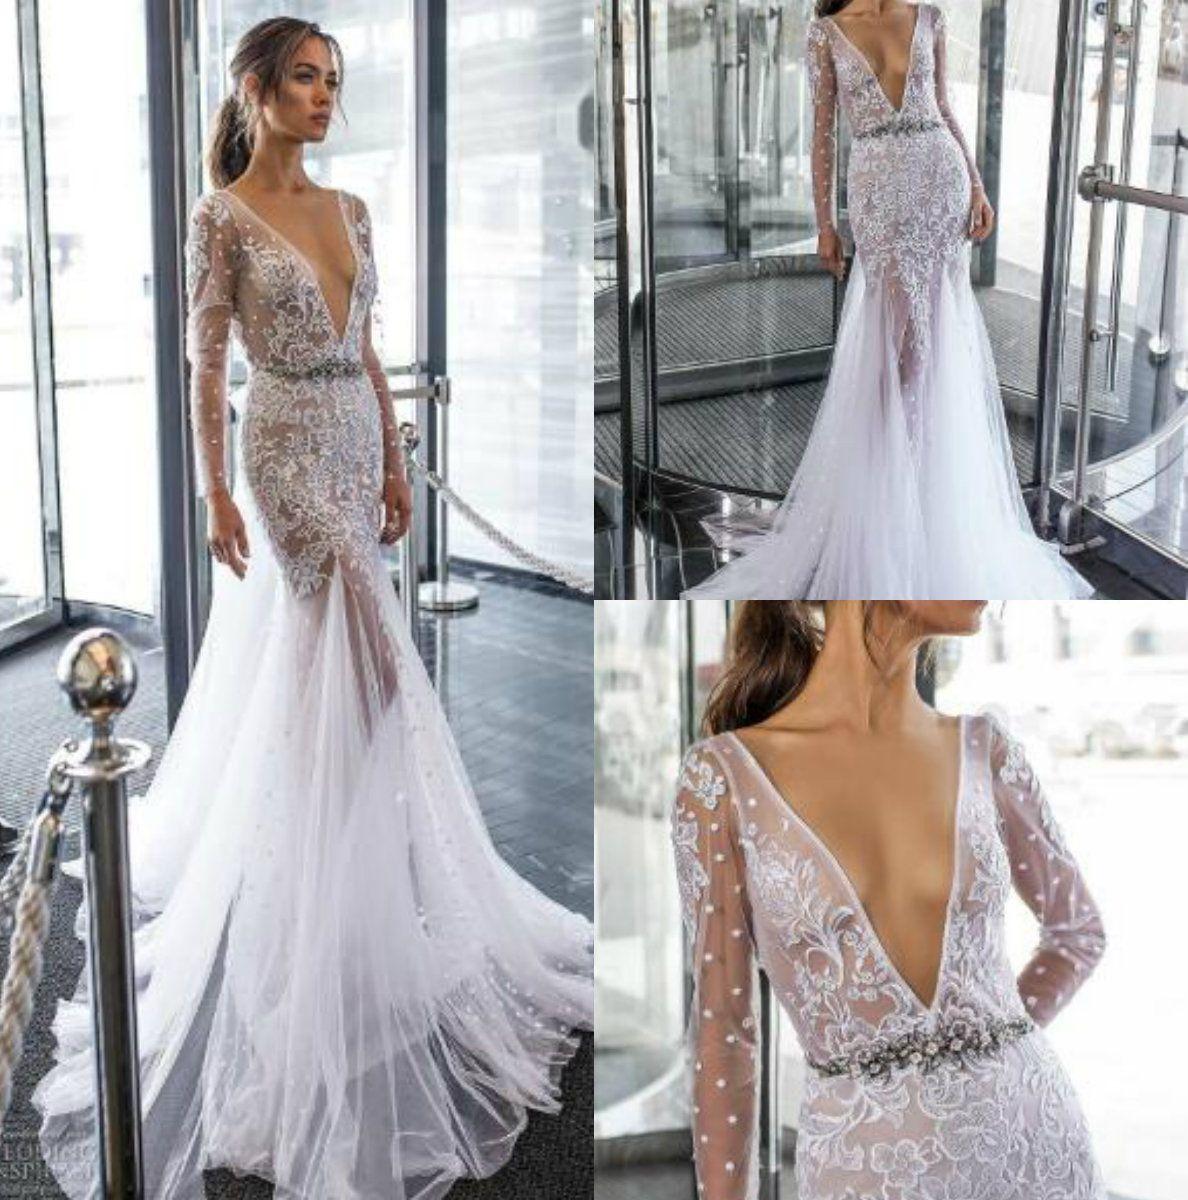 9f5ae1331d8 2018 Dimitrius Dalia Mermaid Wedding Dresses Bridal Gowns Robe De Mariée  Long Sleeve V Neck Lace Vestito Da Sposa Beach Boho Wedding Dress Wedding  Dress Tea ...